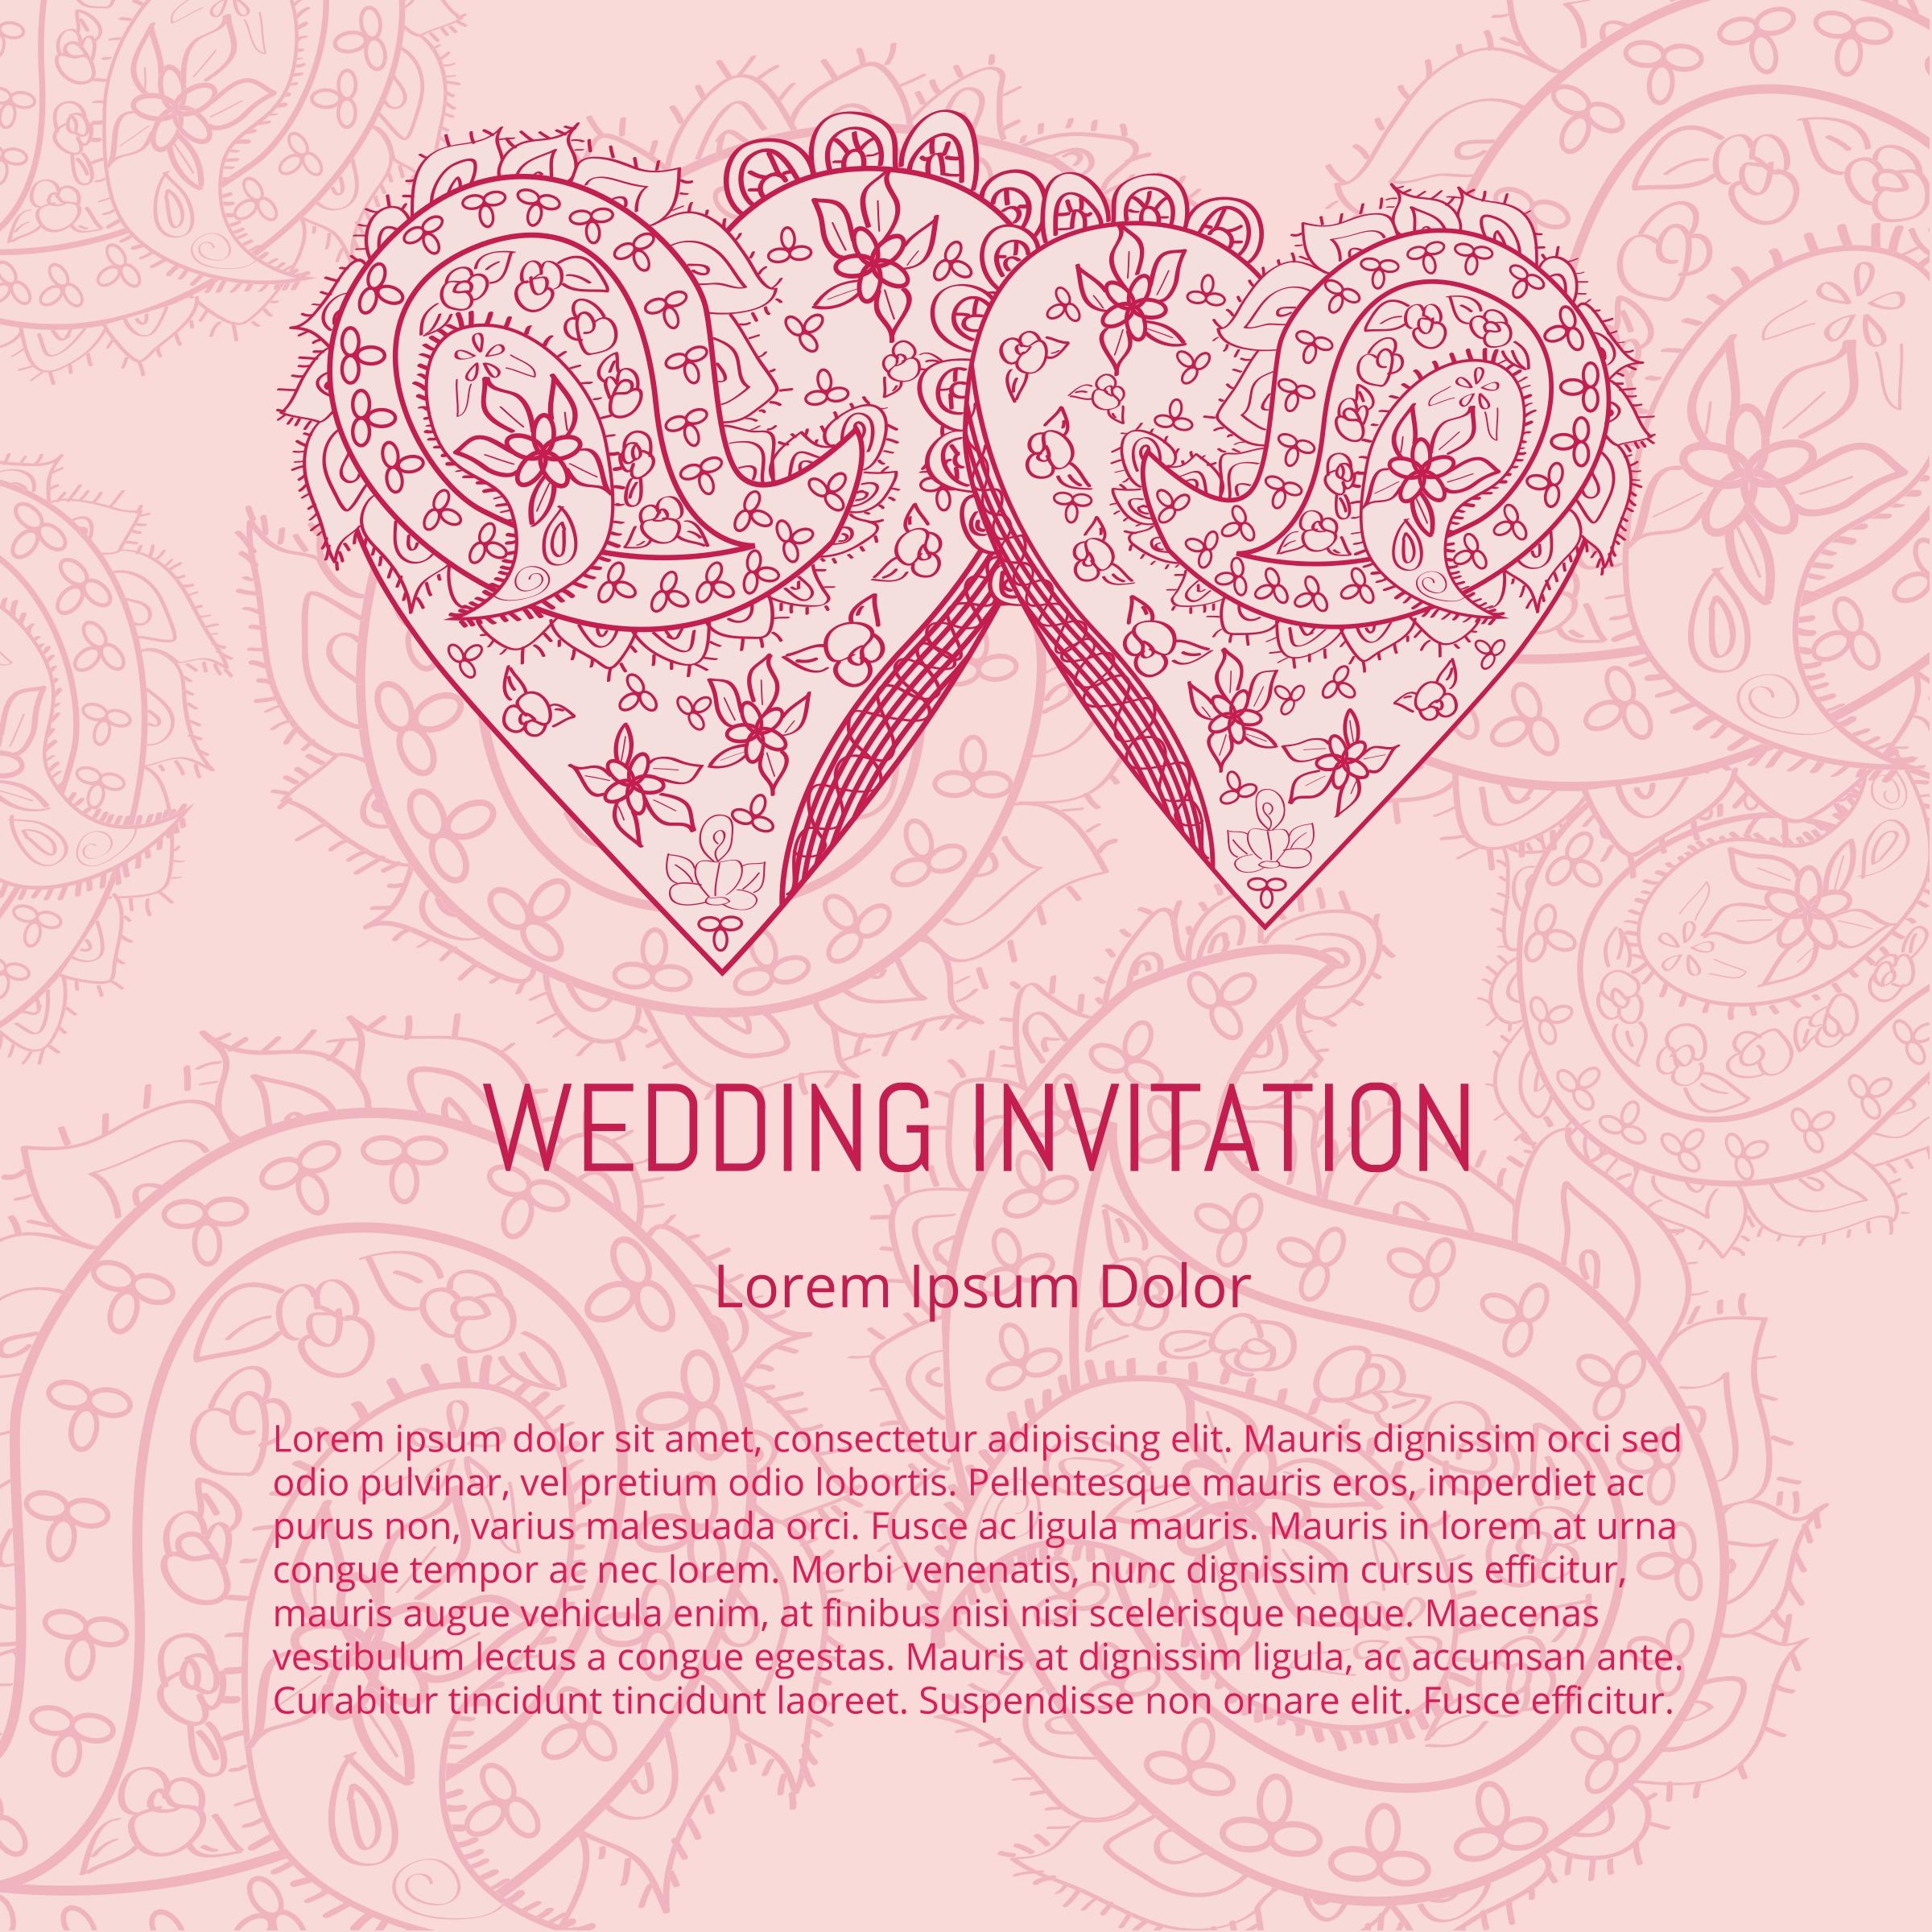 Indian Wedding Card Free Vector Art 8344 Free Downloads – Wedding Cards for Indian Wedding